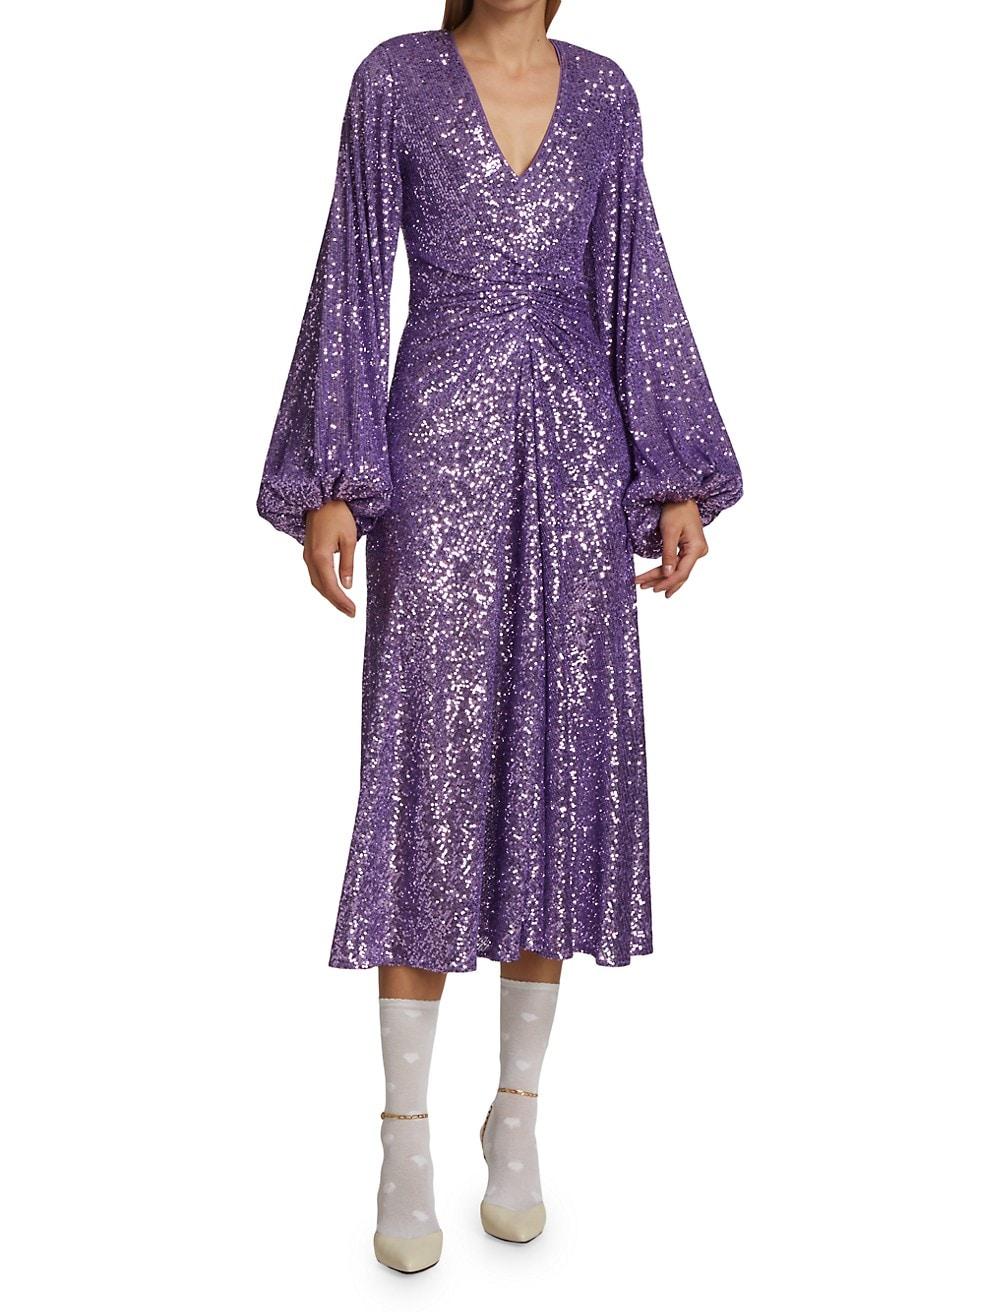 Purple sequin puff sleeve midi dress for winter wedding guest.